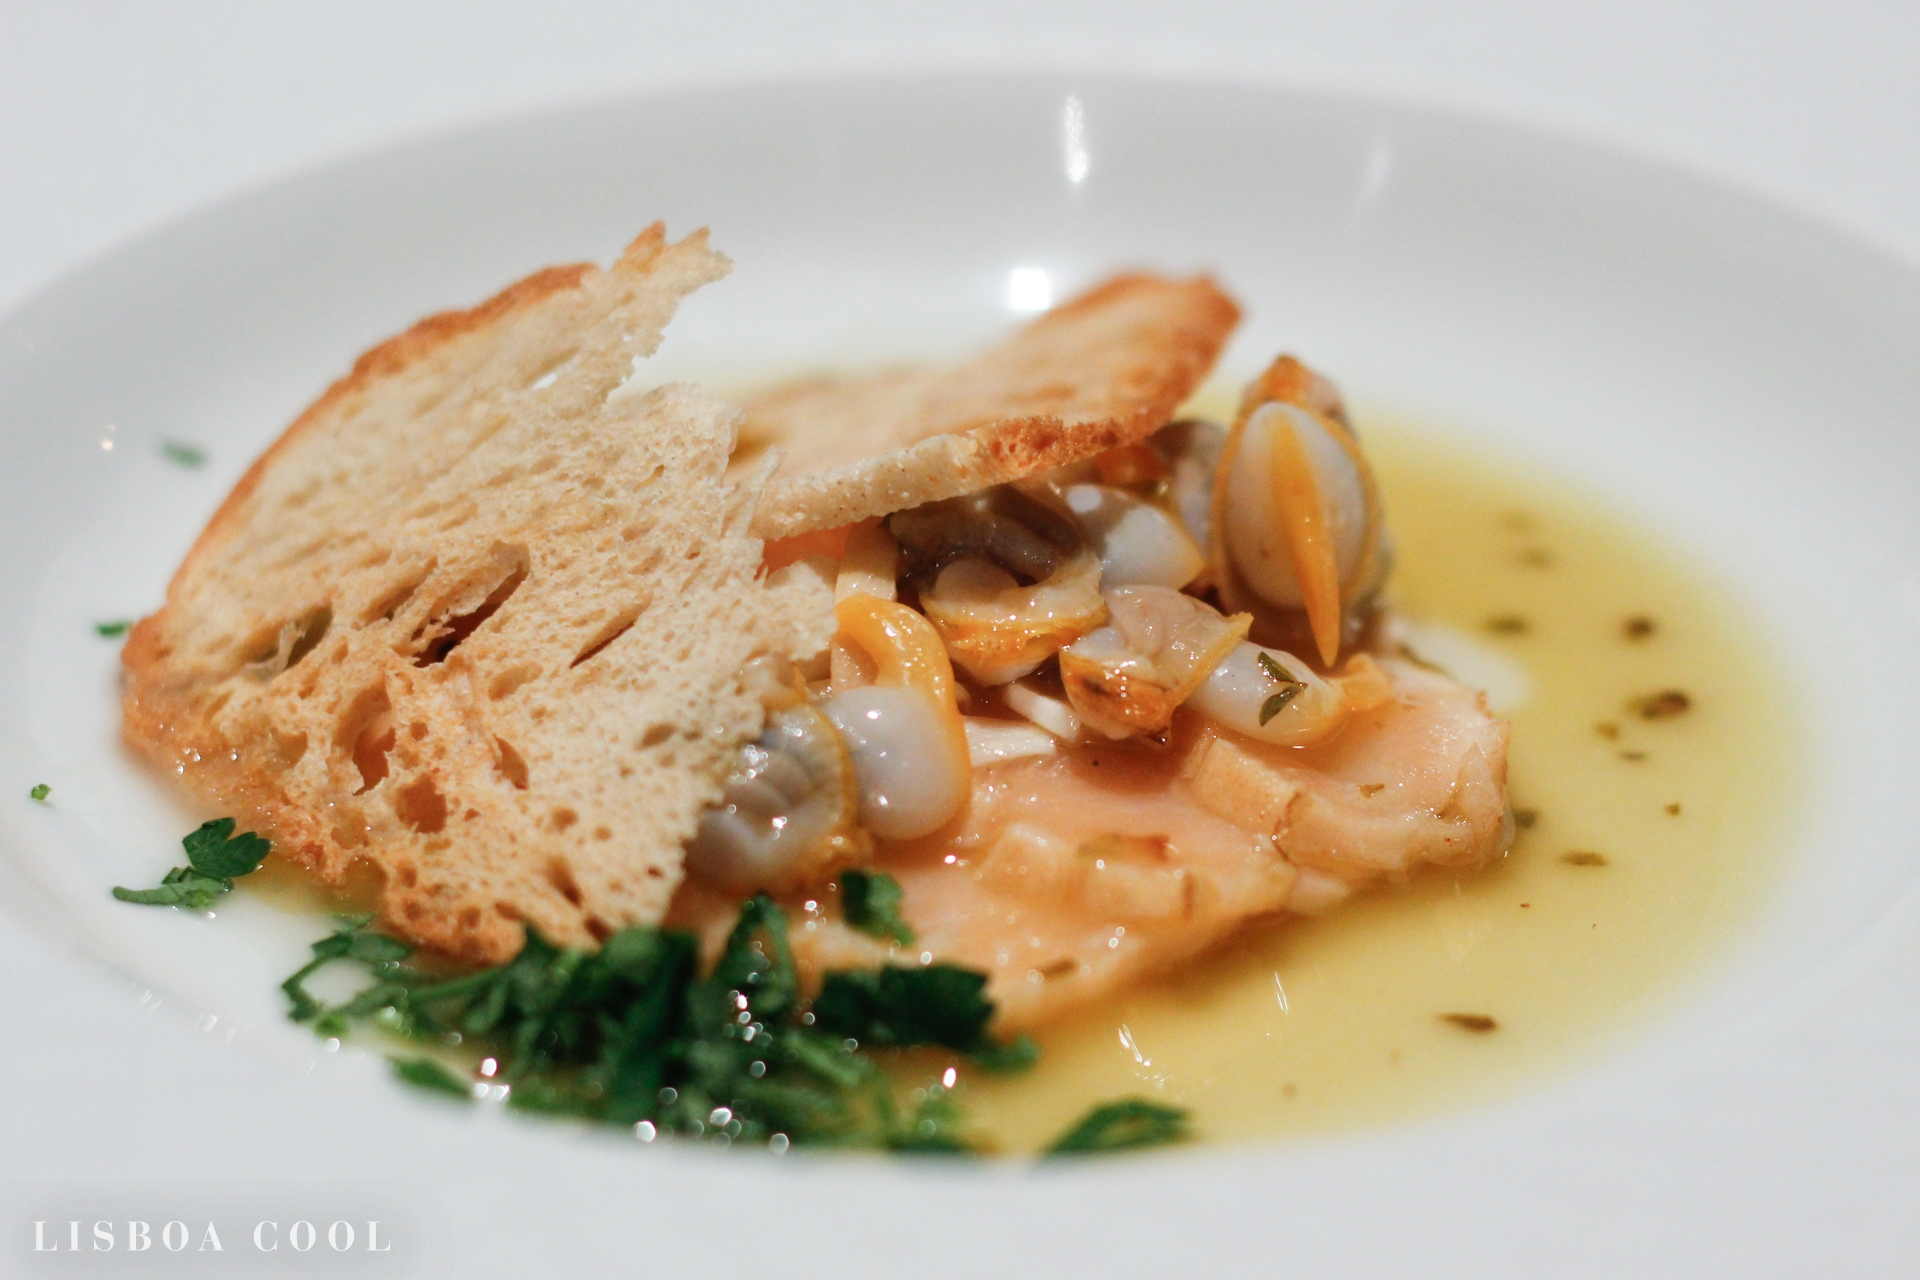 lisboa_cool_comer_restaurantes_tasca_da_esquina